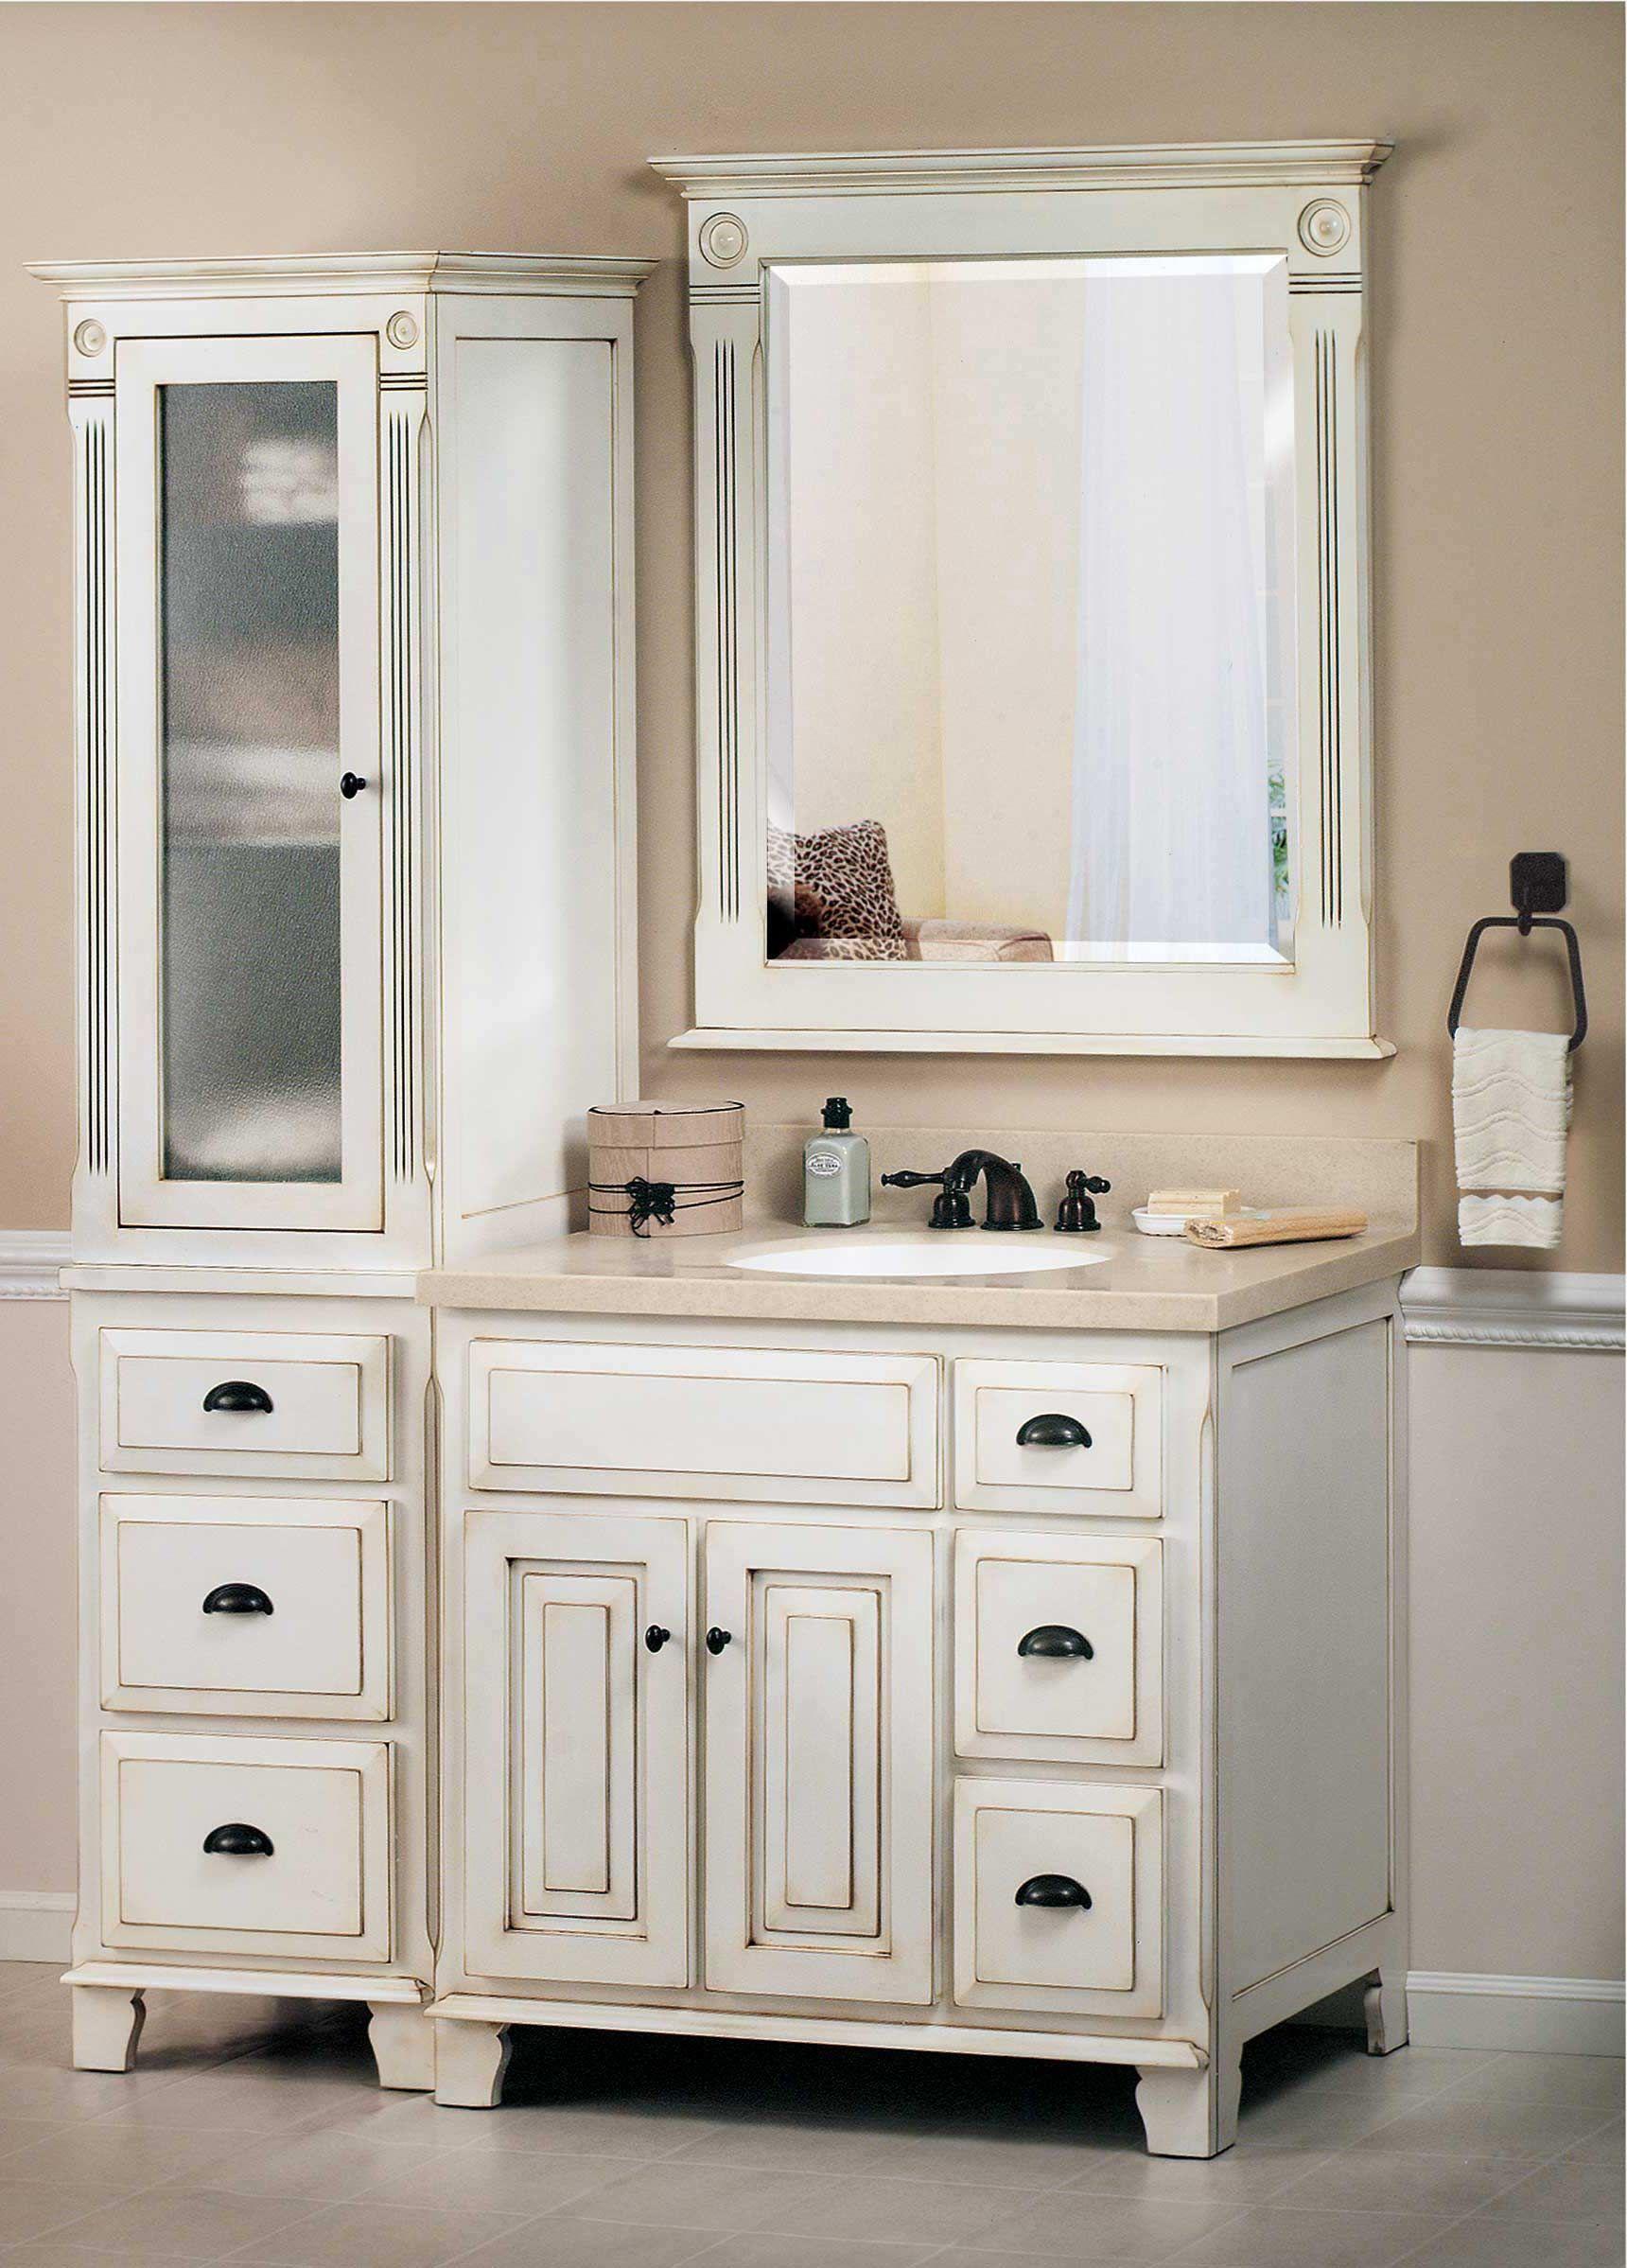 Bathroom Simple Victorian Vanities With Minimalist Decoration And ...